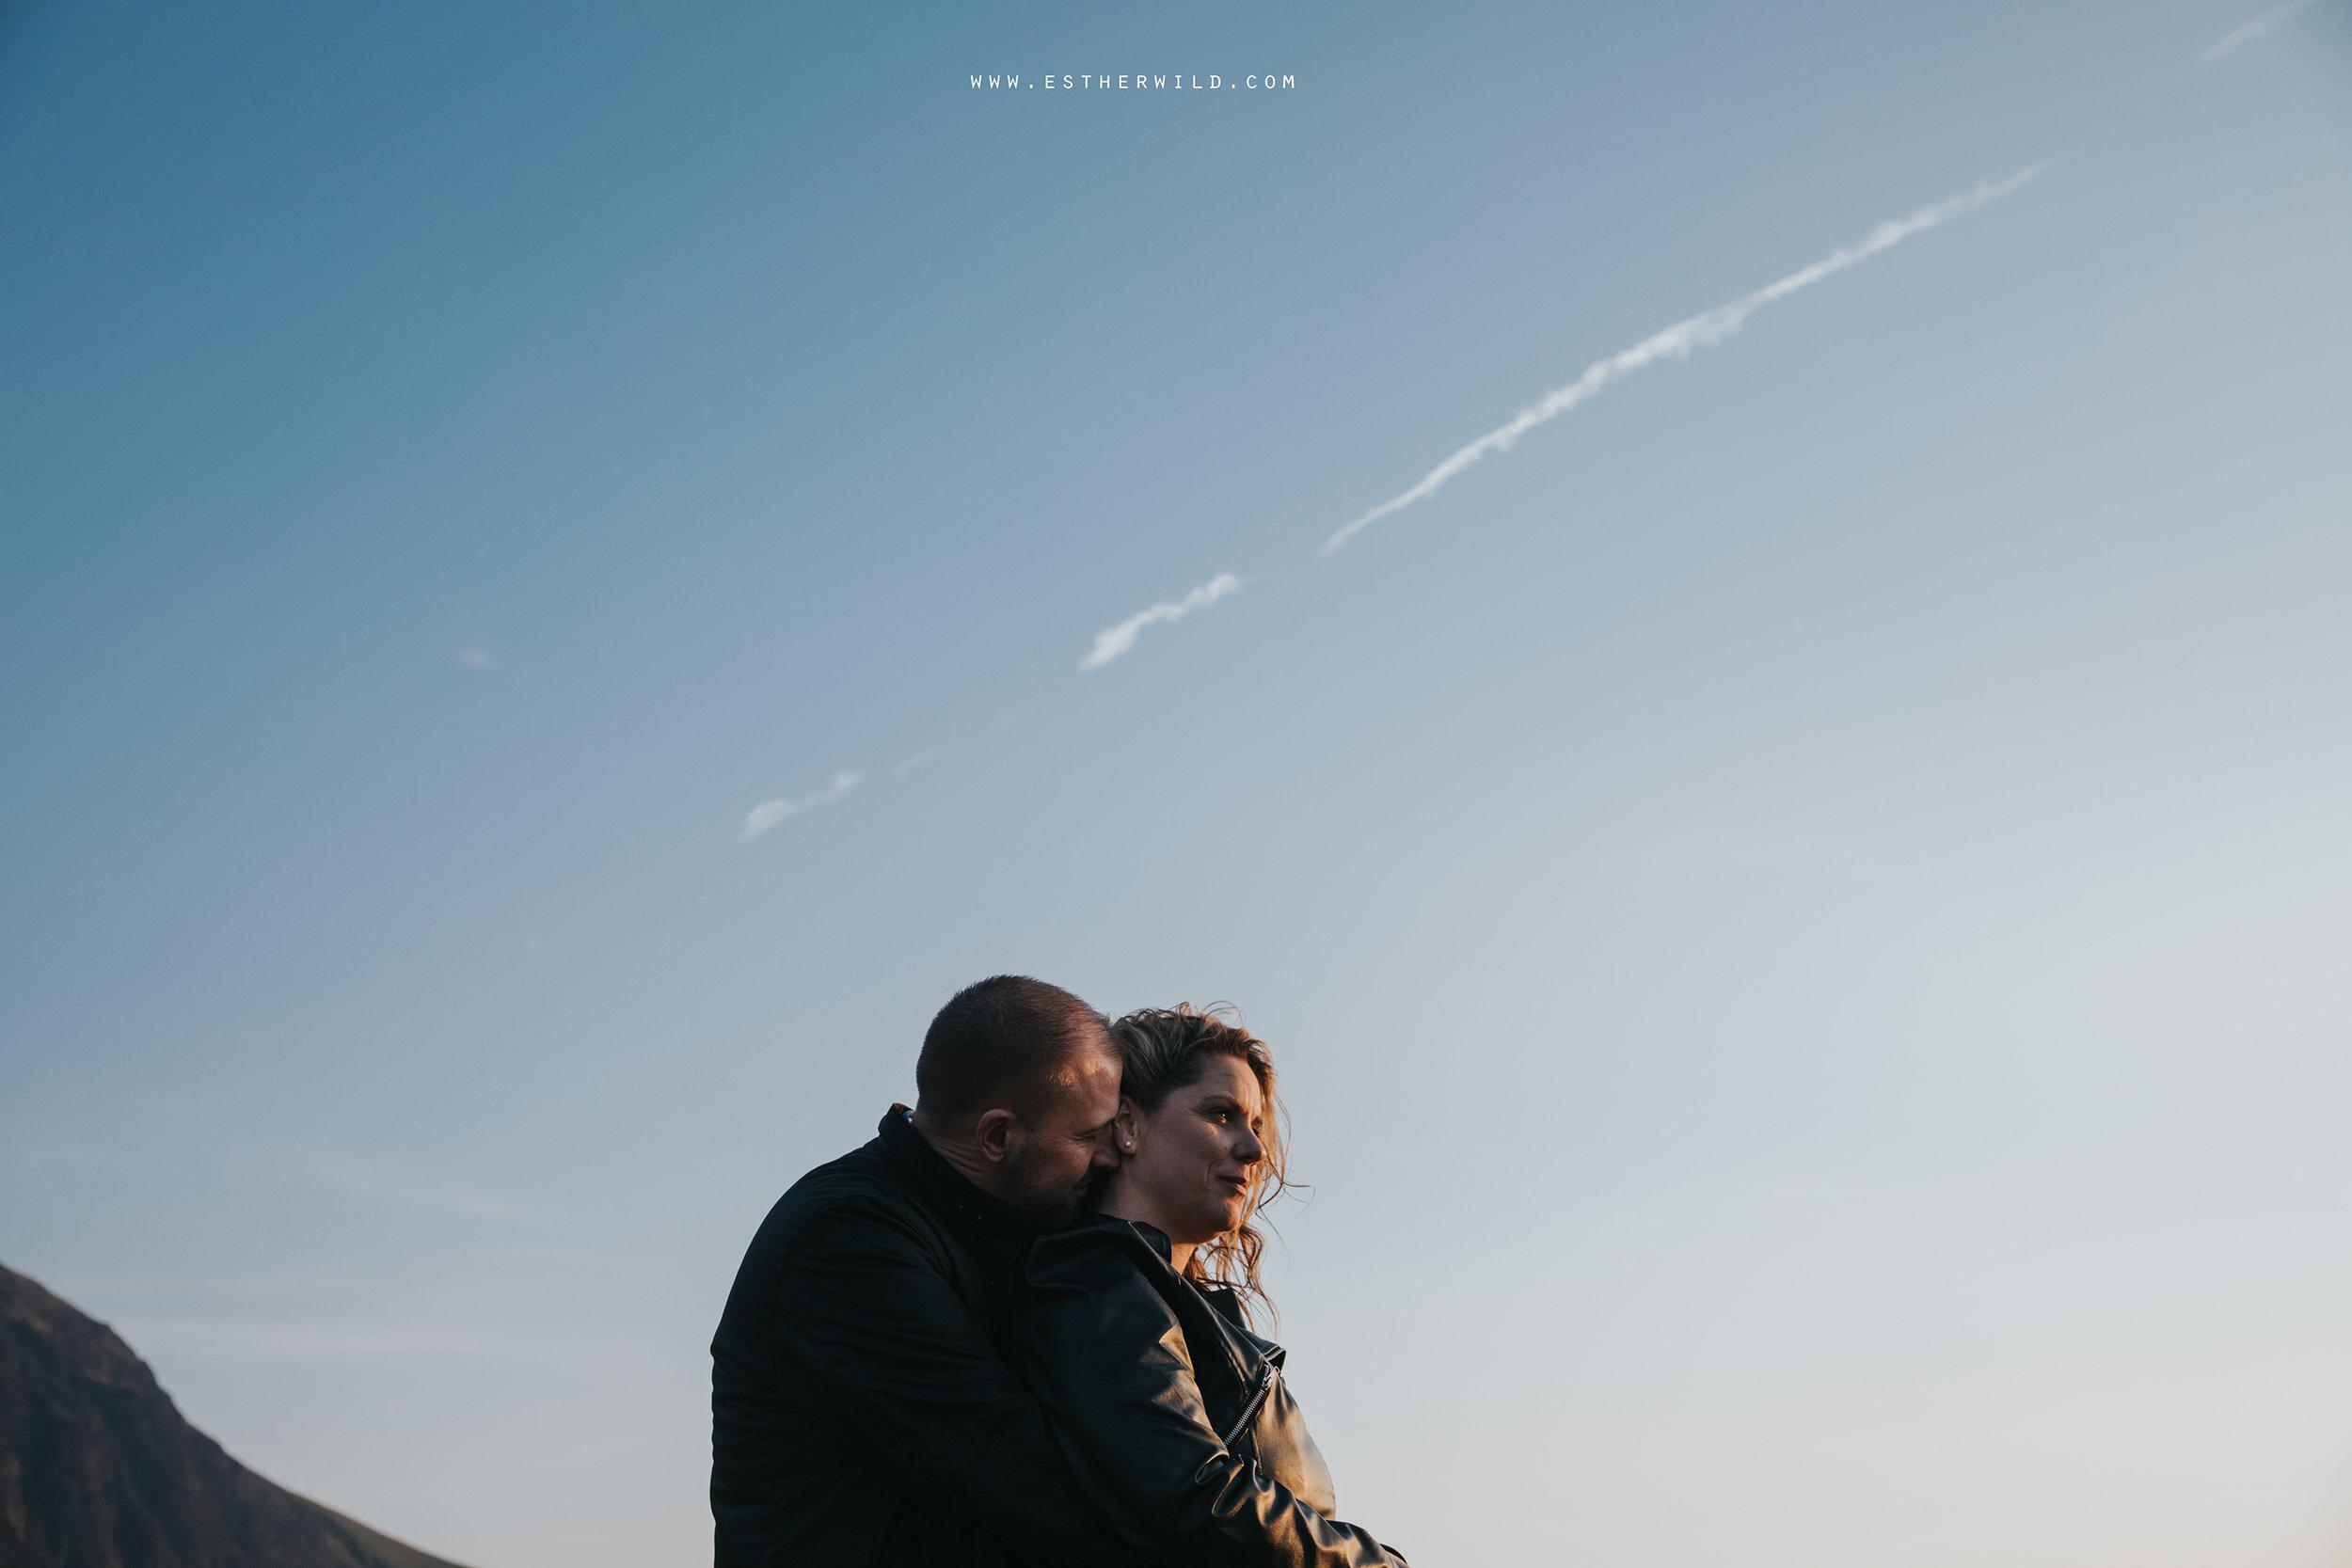 Cumbria_Lake_District_Wasdale_Wedding_Photographer_Destination_Engagement_Anniversary_Esther_Wild_IMG_4718.jpg